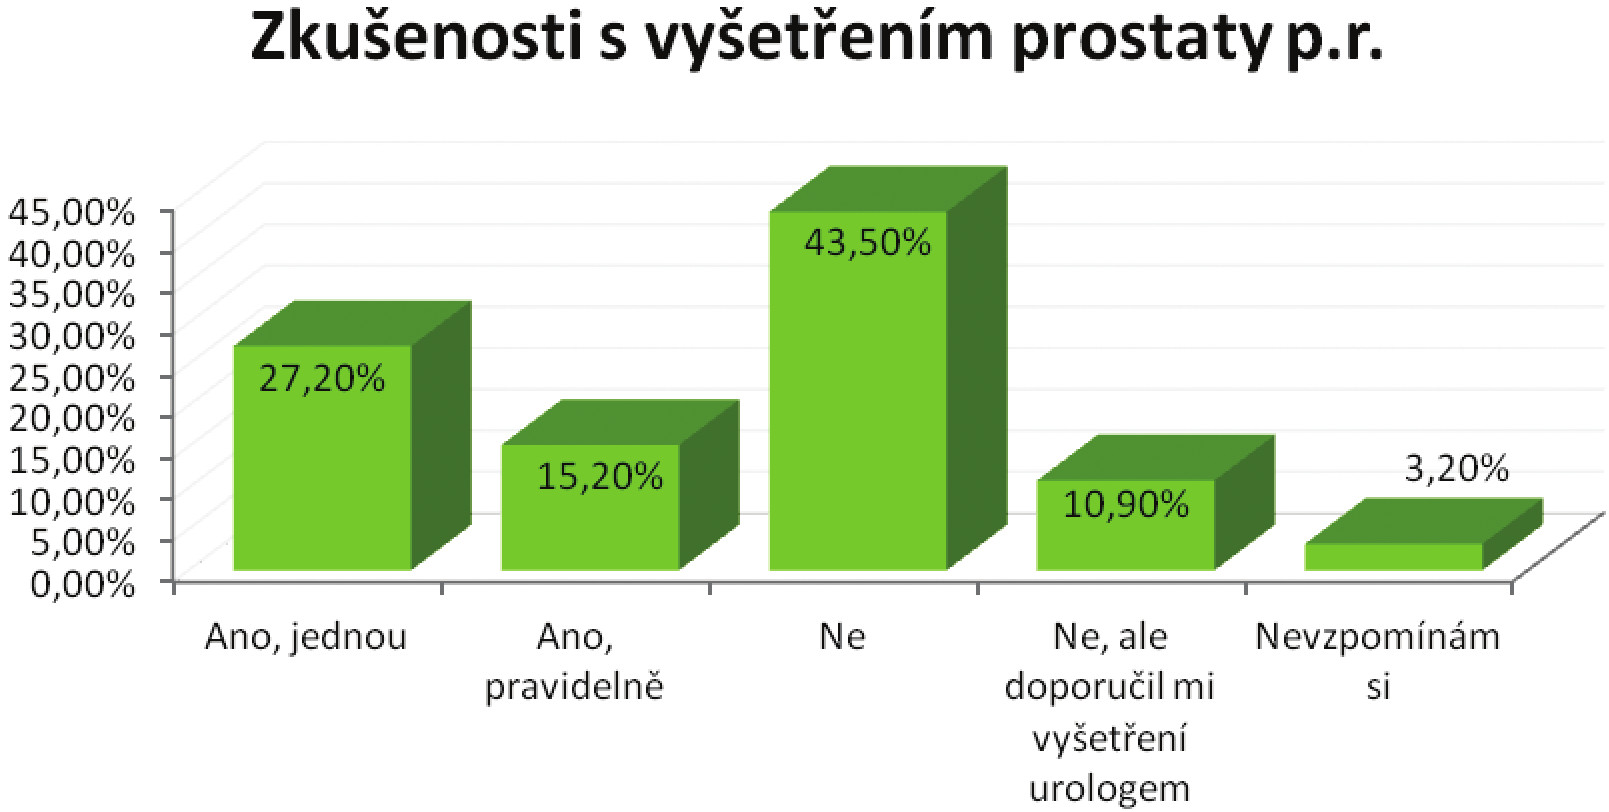 Zkušenosti respondentů s vyšetřením prostaty per rectum Graph 3: The experience of respondents with the per rectum examination